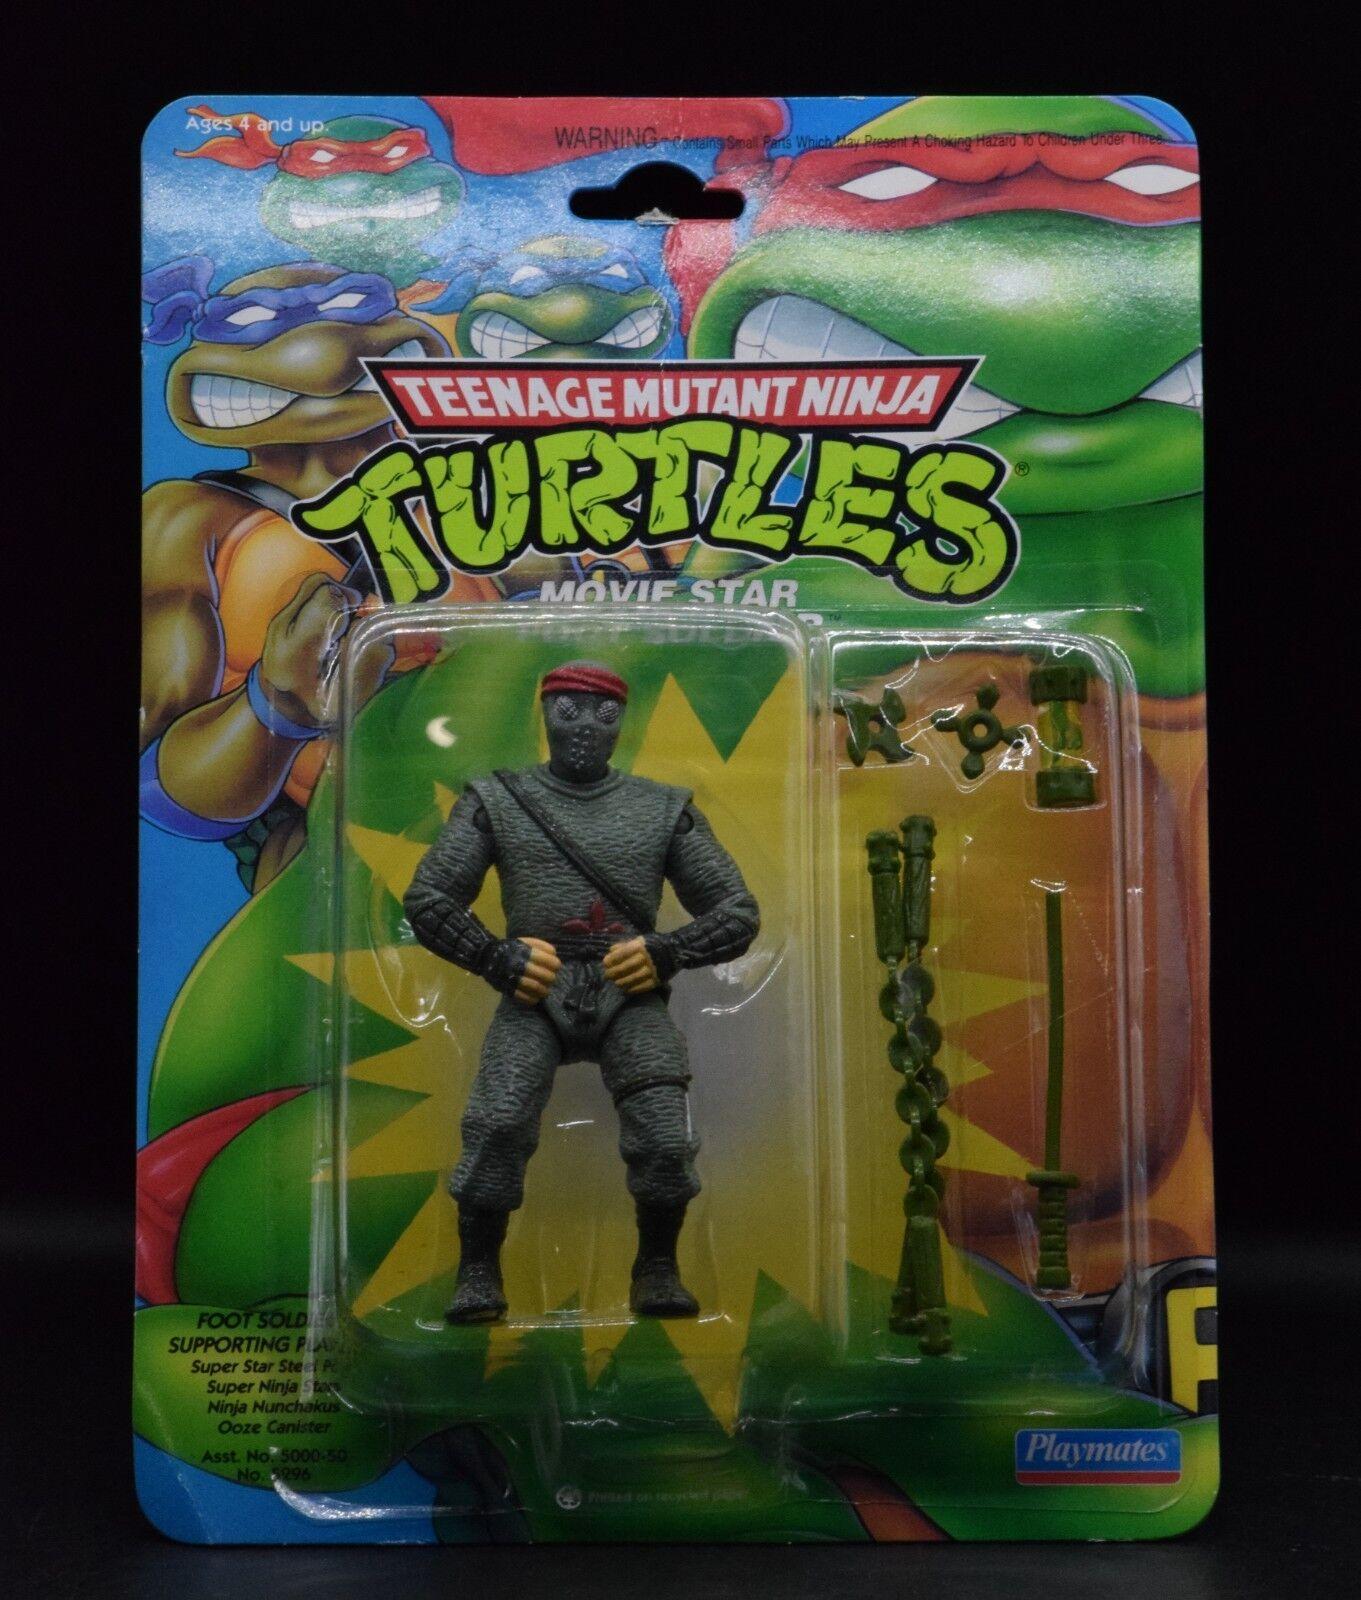 1992 Jugarmates Teenage Mutant Ninja Turtles estrella de cine de improviso Teenage Mutant Ninja Turtles menta en tarjeta MIP